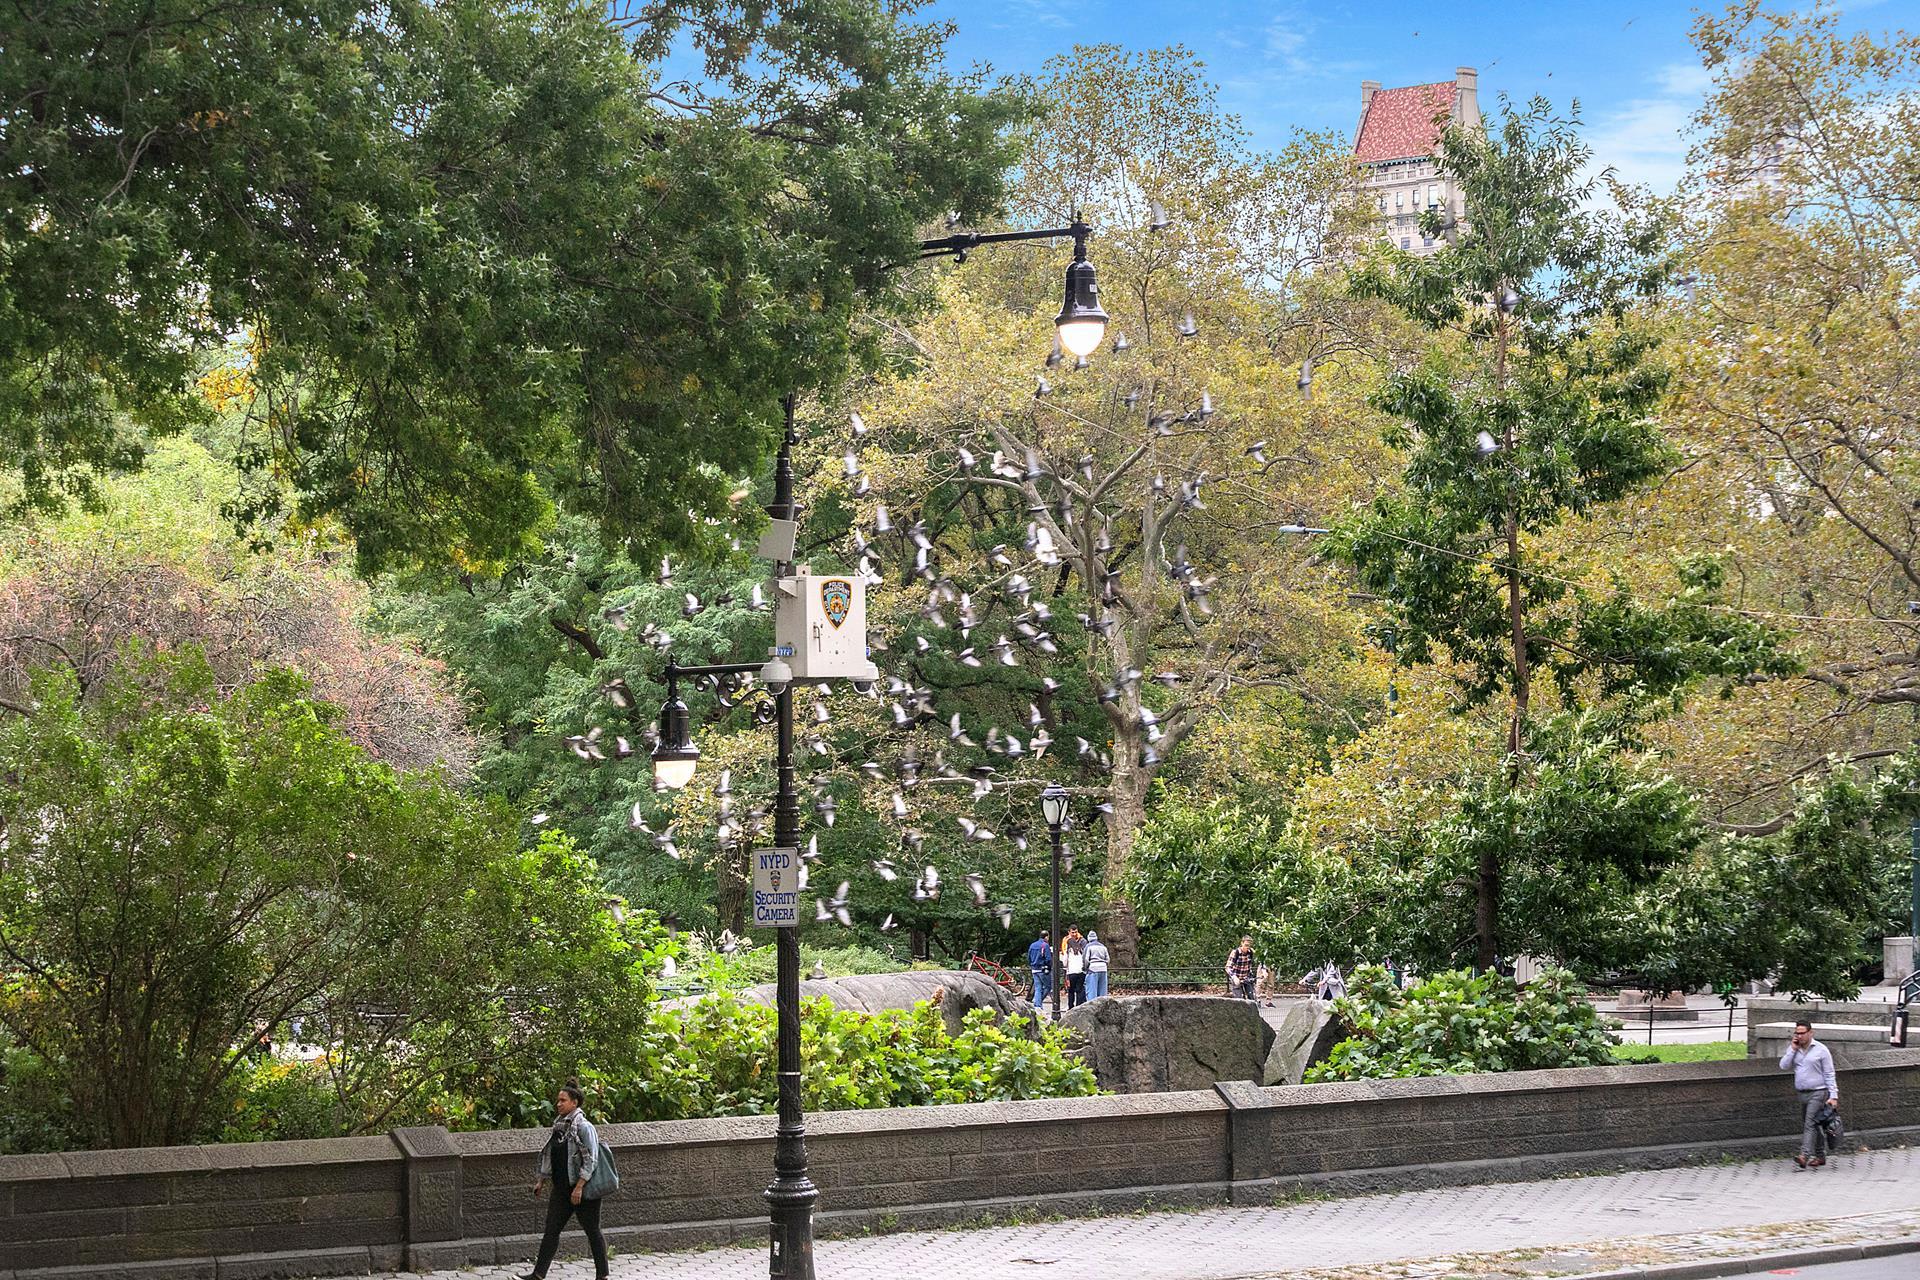 120 Central Park South Central Park South New York NY 10019